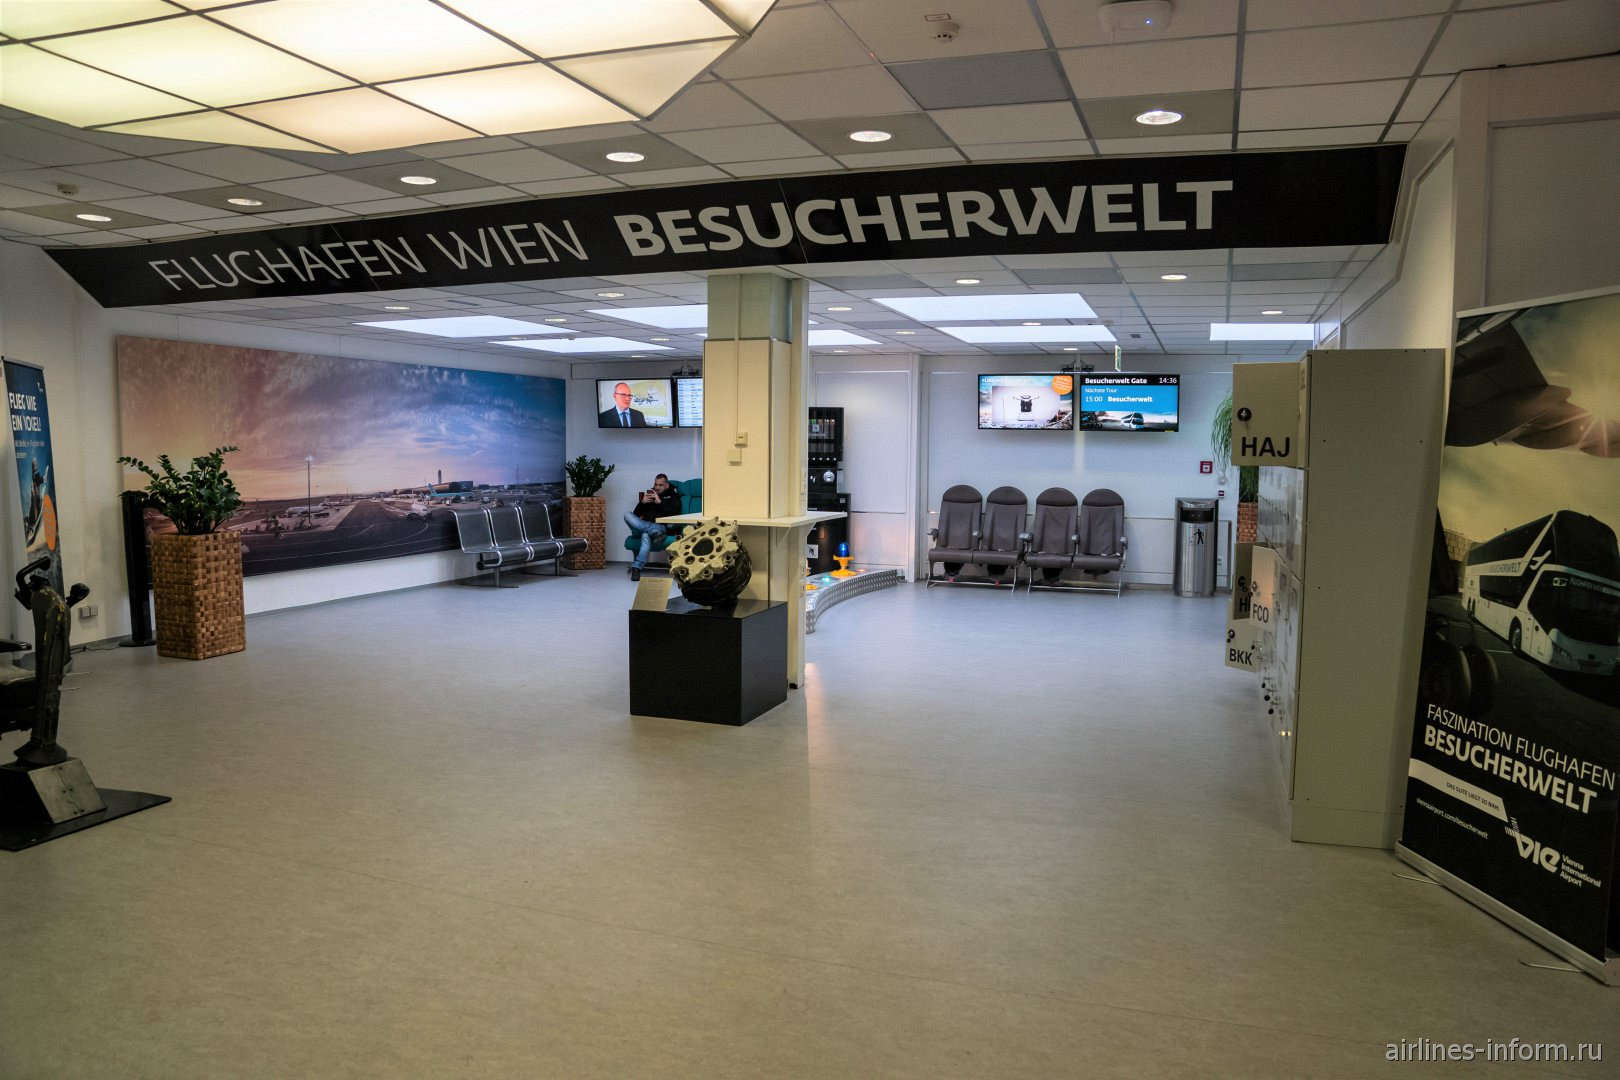 Зал ожидания терминала Besucherwelt в аэропорту Вена-Швехат